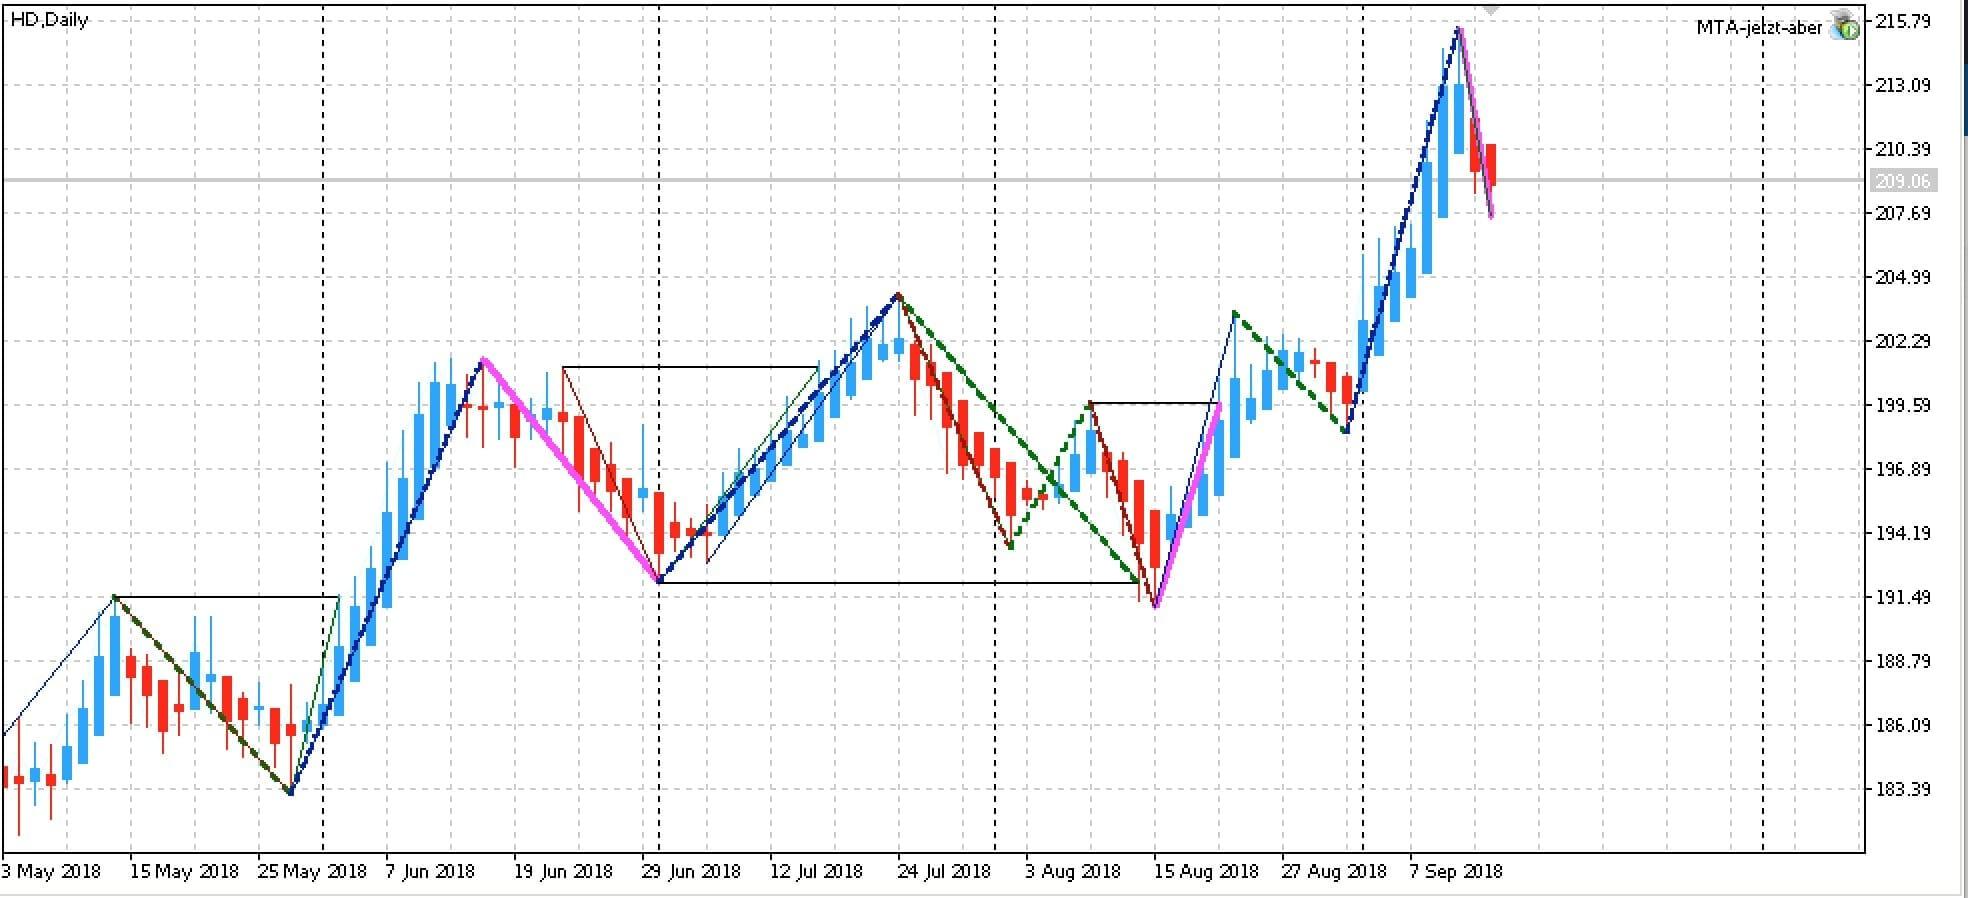 Home Depot Inc (HD LONG) | Statistic Trading